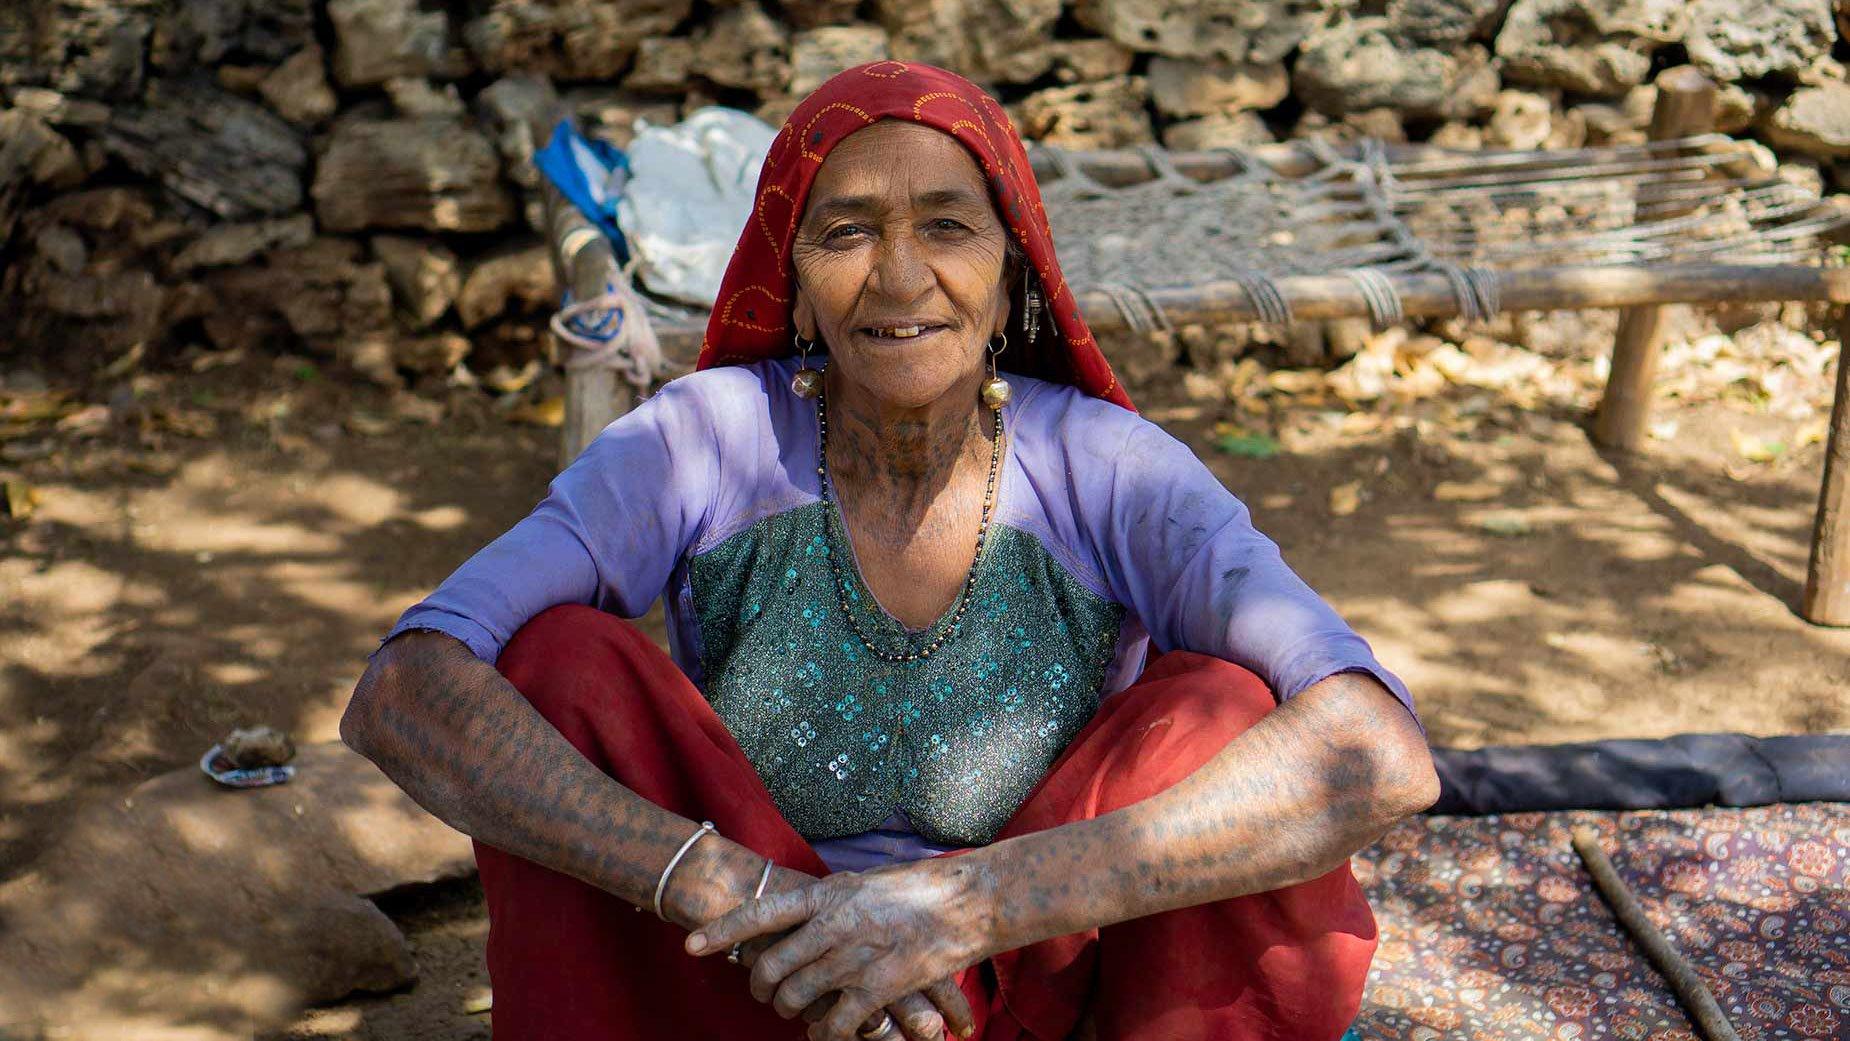 Gir sheperd woman portrait